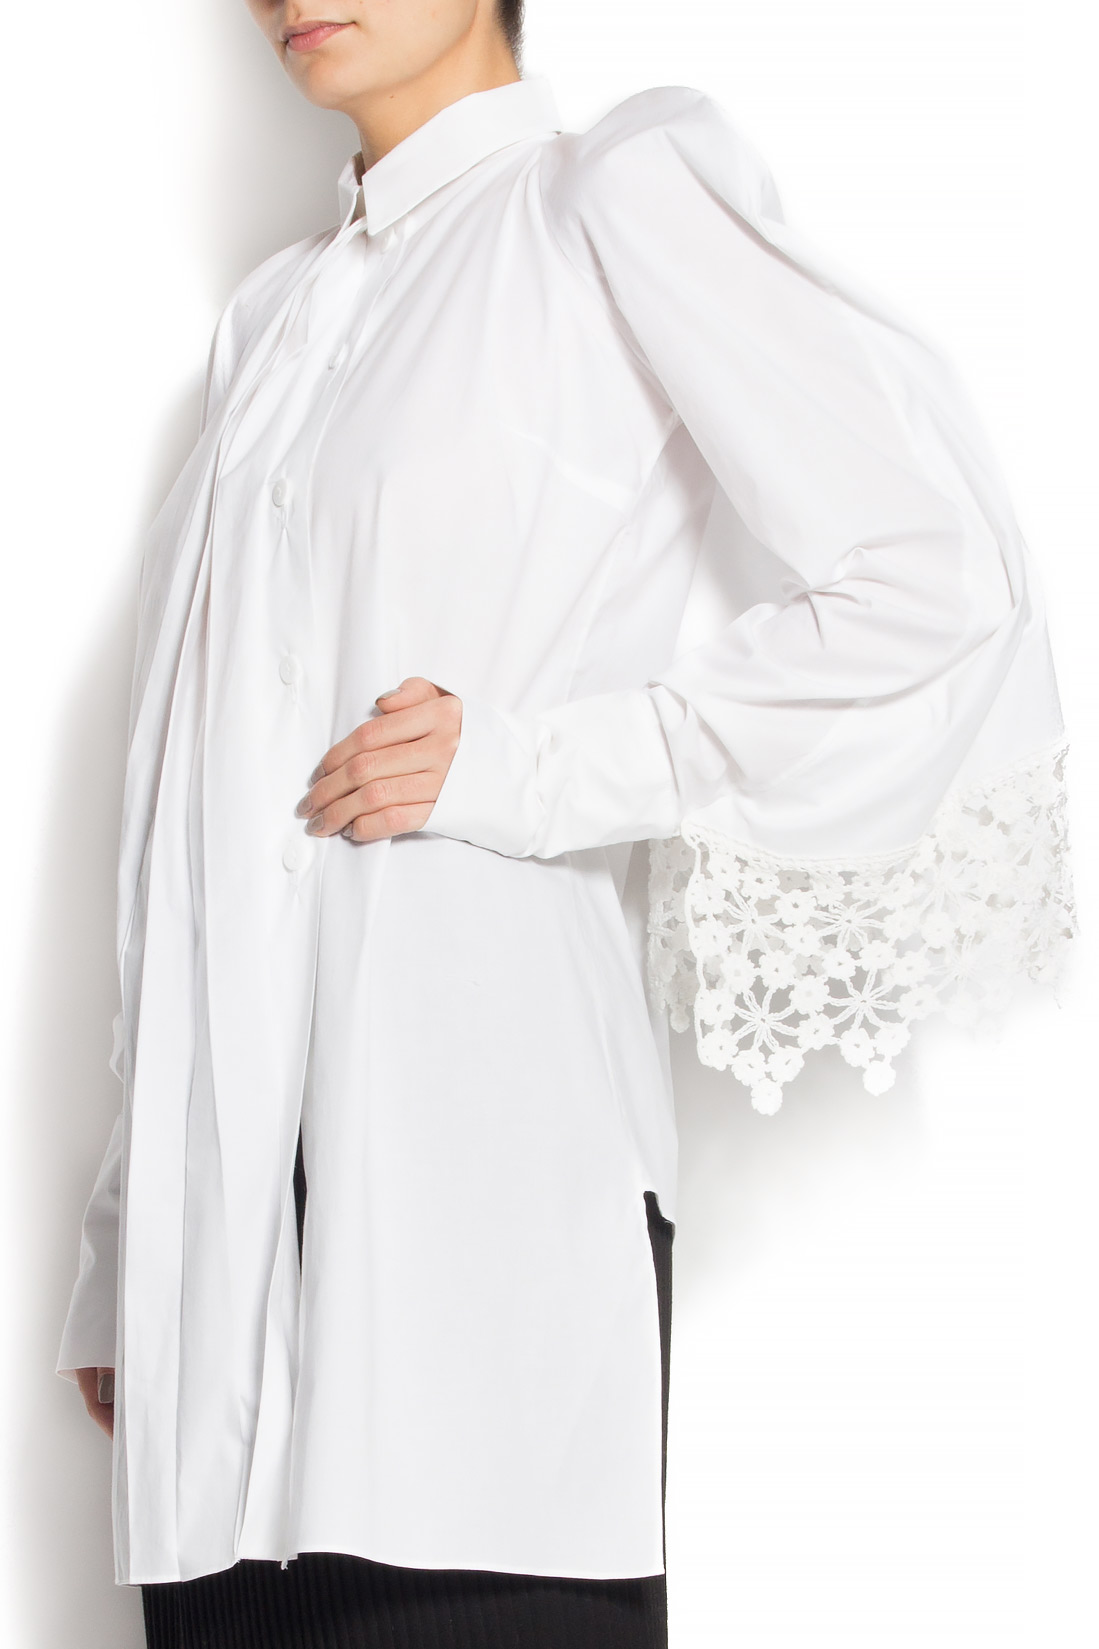 Camasa din bumbac cu mantie integrata Dorin Negrau imagine 2